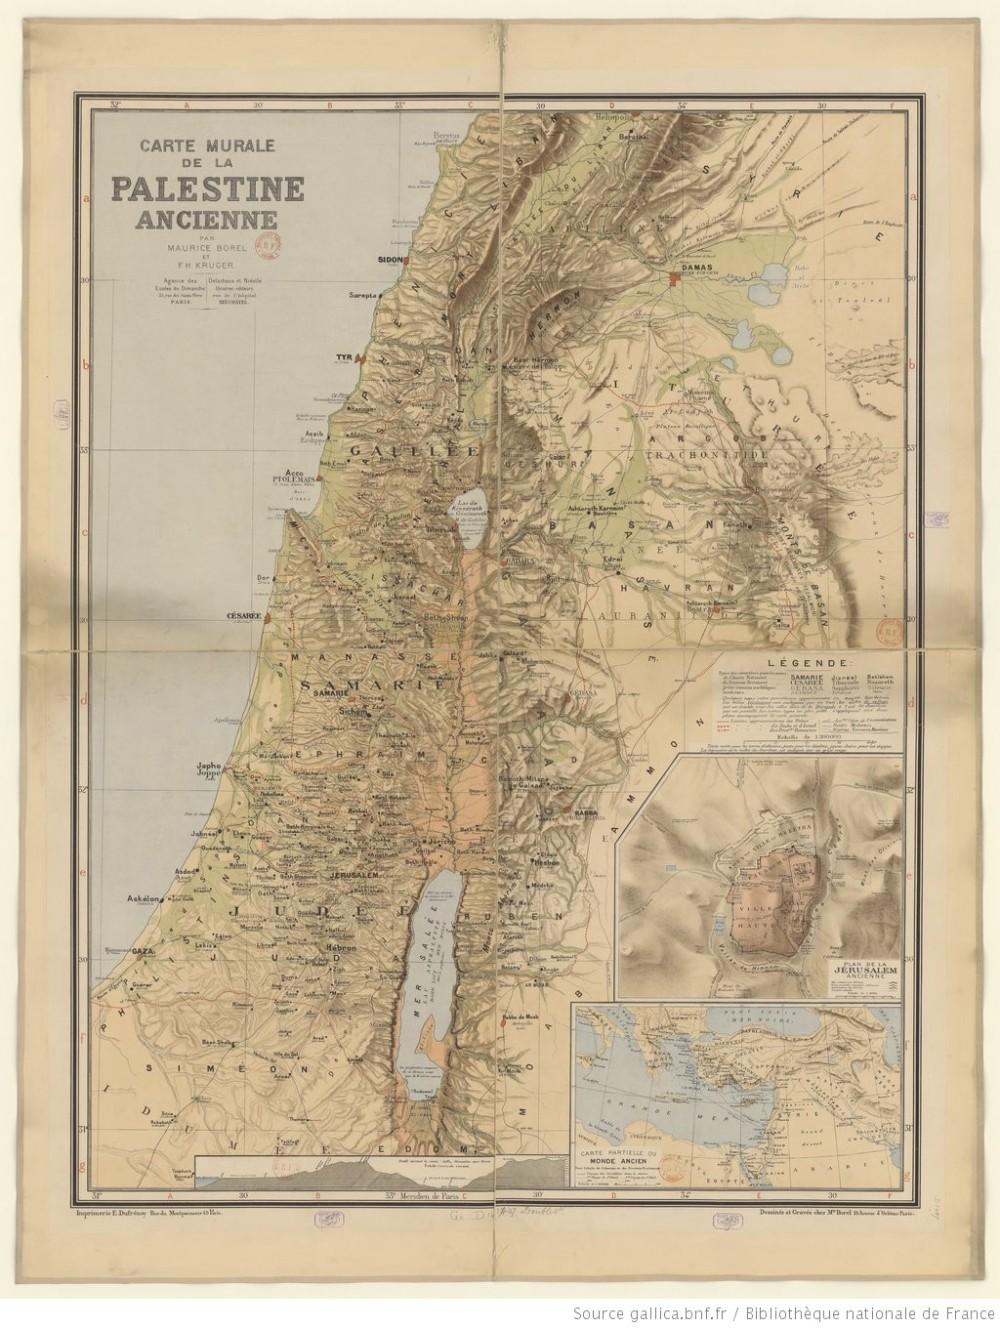 Carte_murale_de_la_Palestine_[...]Borel_Maurice_btv1b53006693m